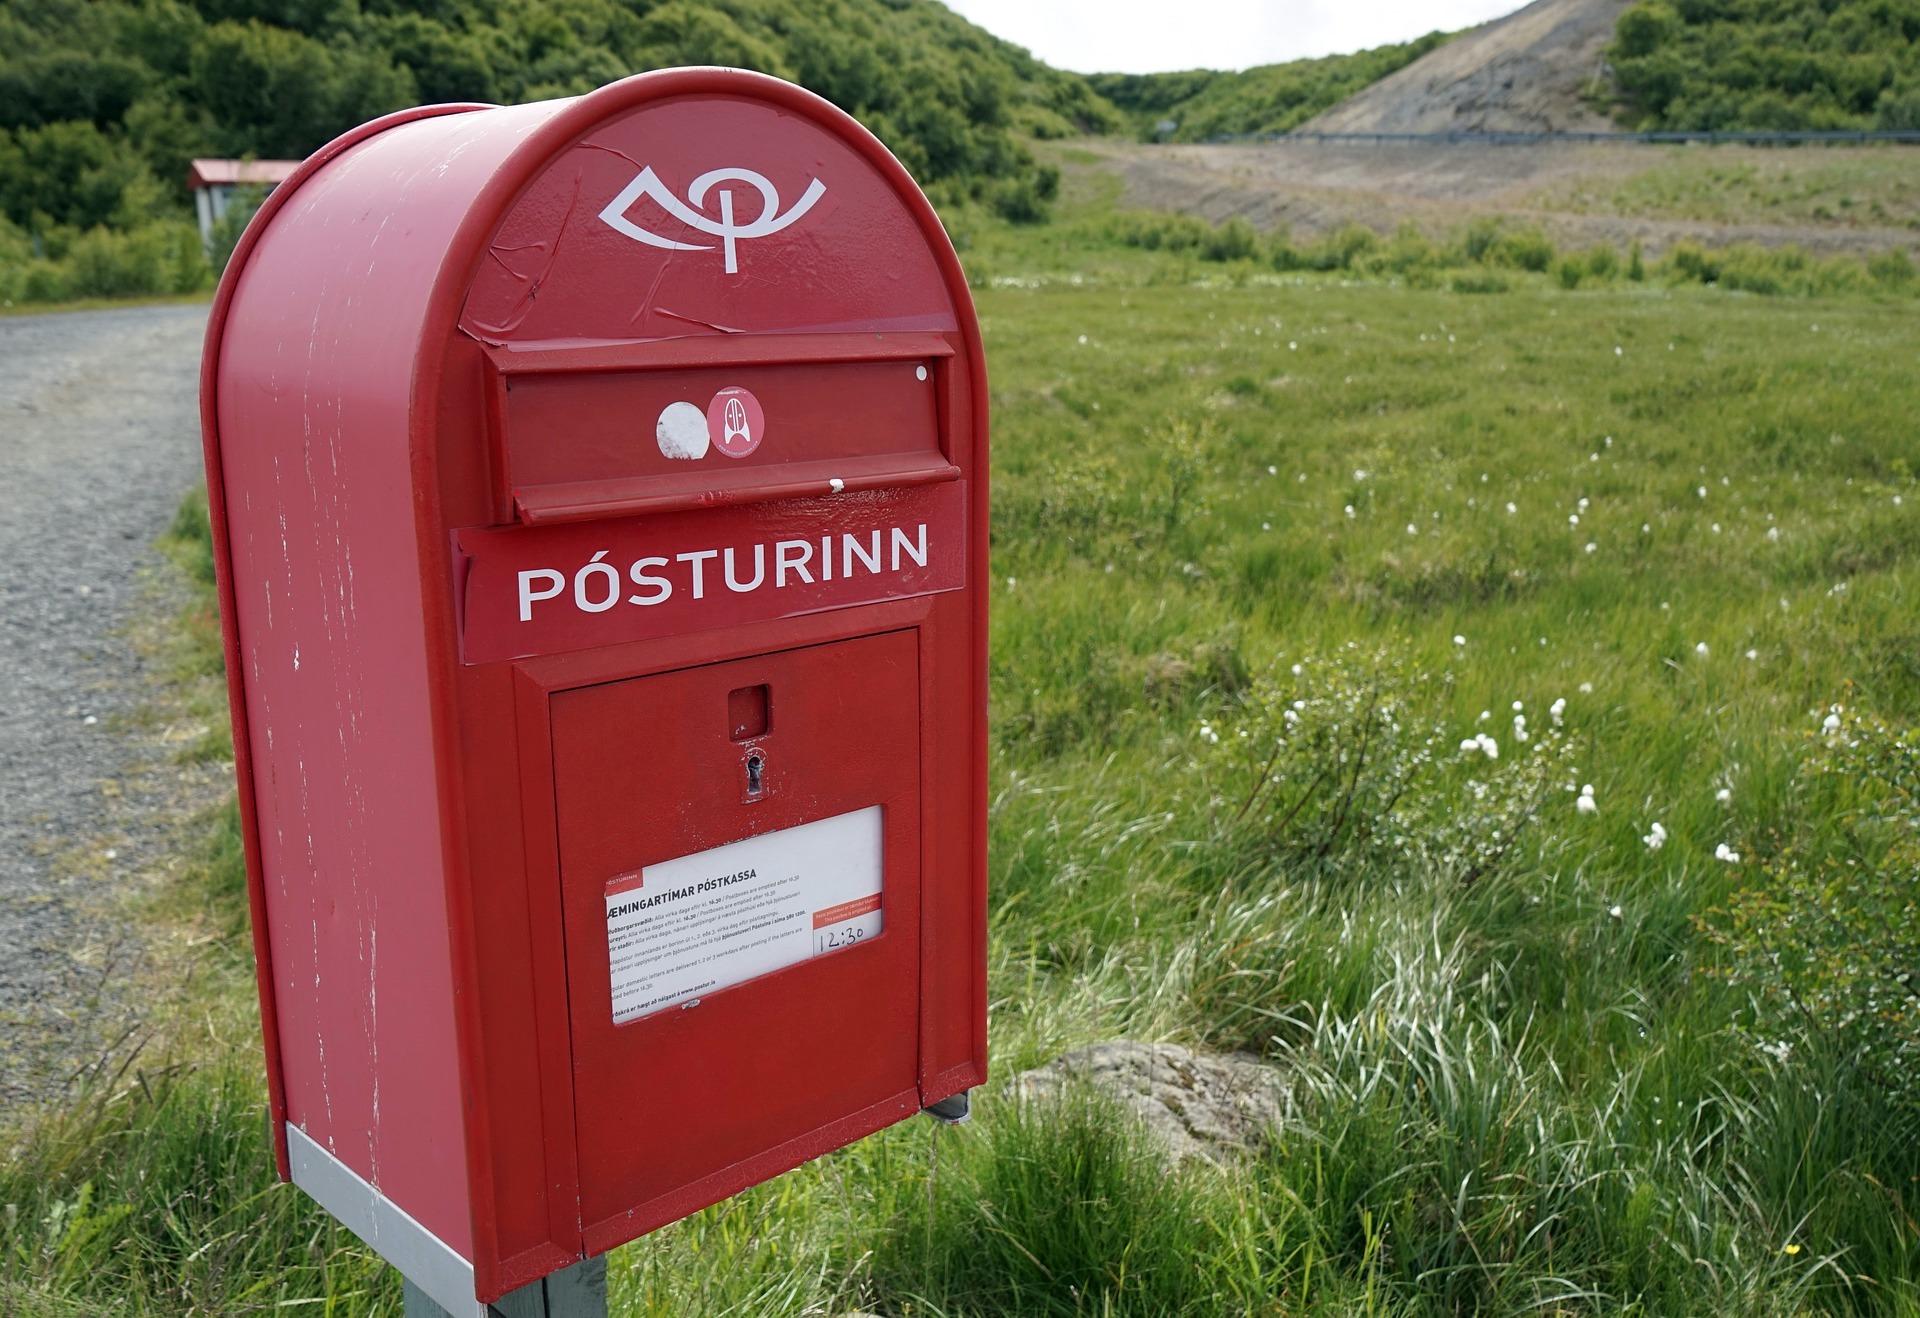 Boite aux lettres ©Barni1 CC0 Pixabay